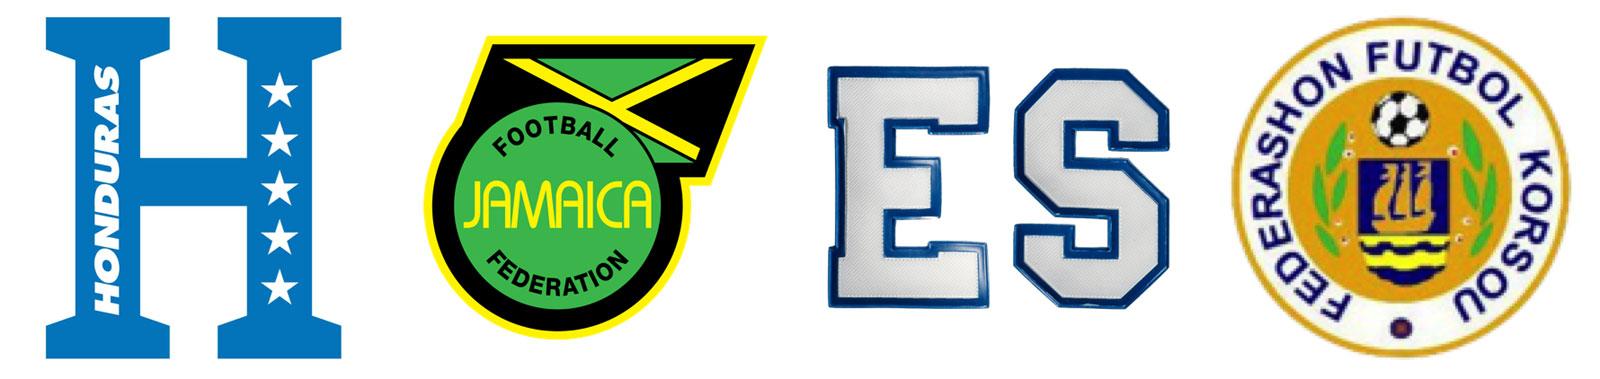 Honduras, Jamaica, El Salvador and Curacao play in Gold Cup Group C